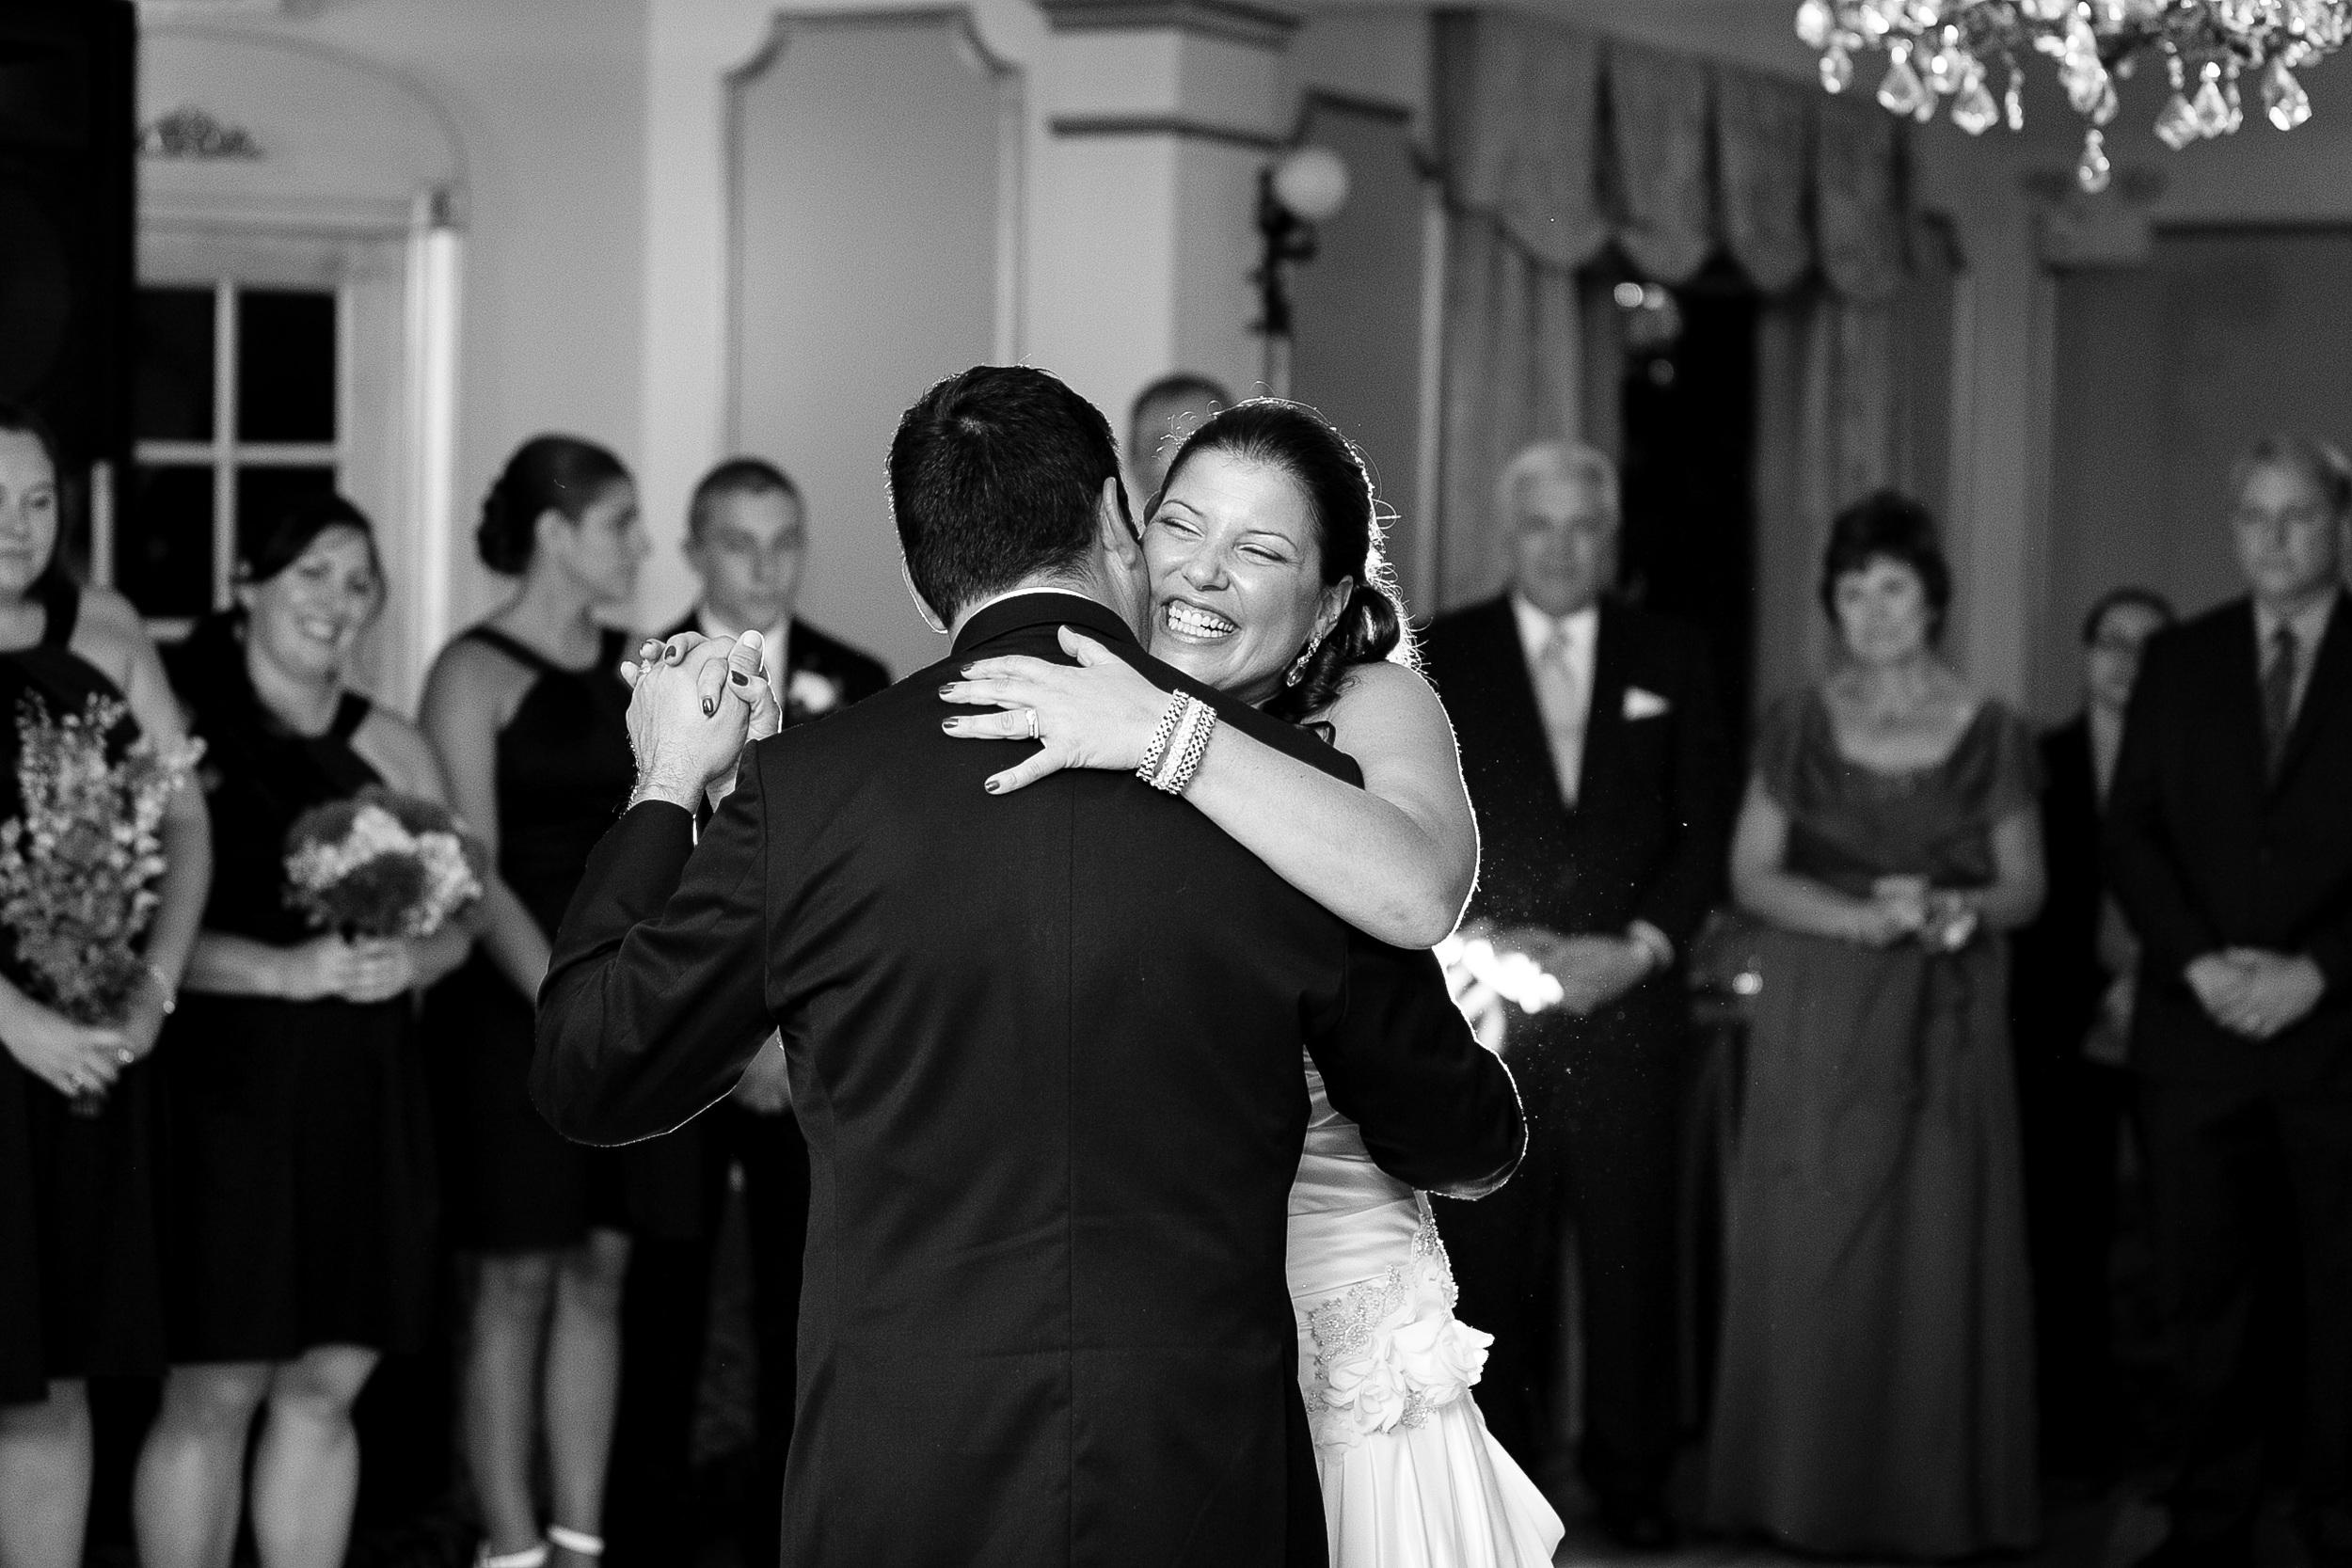 Elegant-Wedding-The-Fox-Hill-Inn-Brookfield-Connecticut-Photojournalistic-Photography-by-Jacek-Dolata-26.jpg